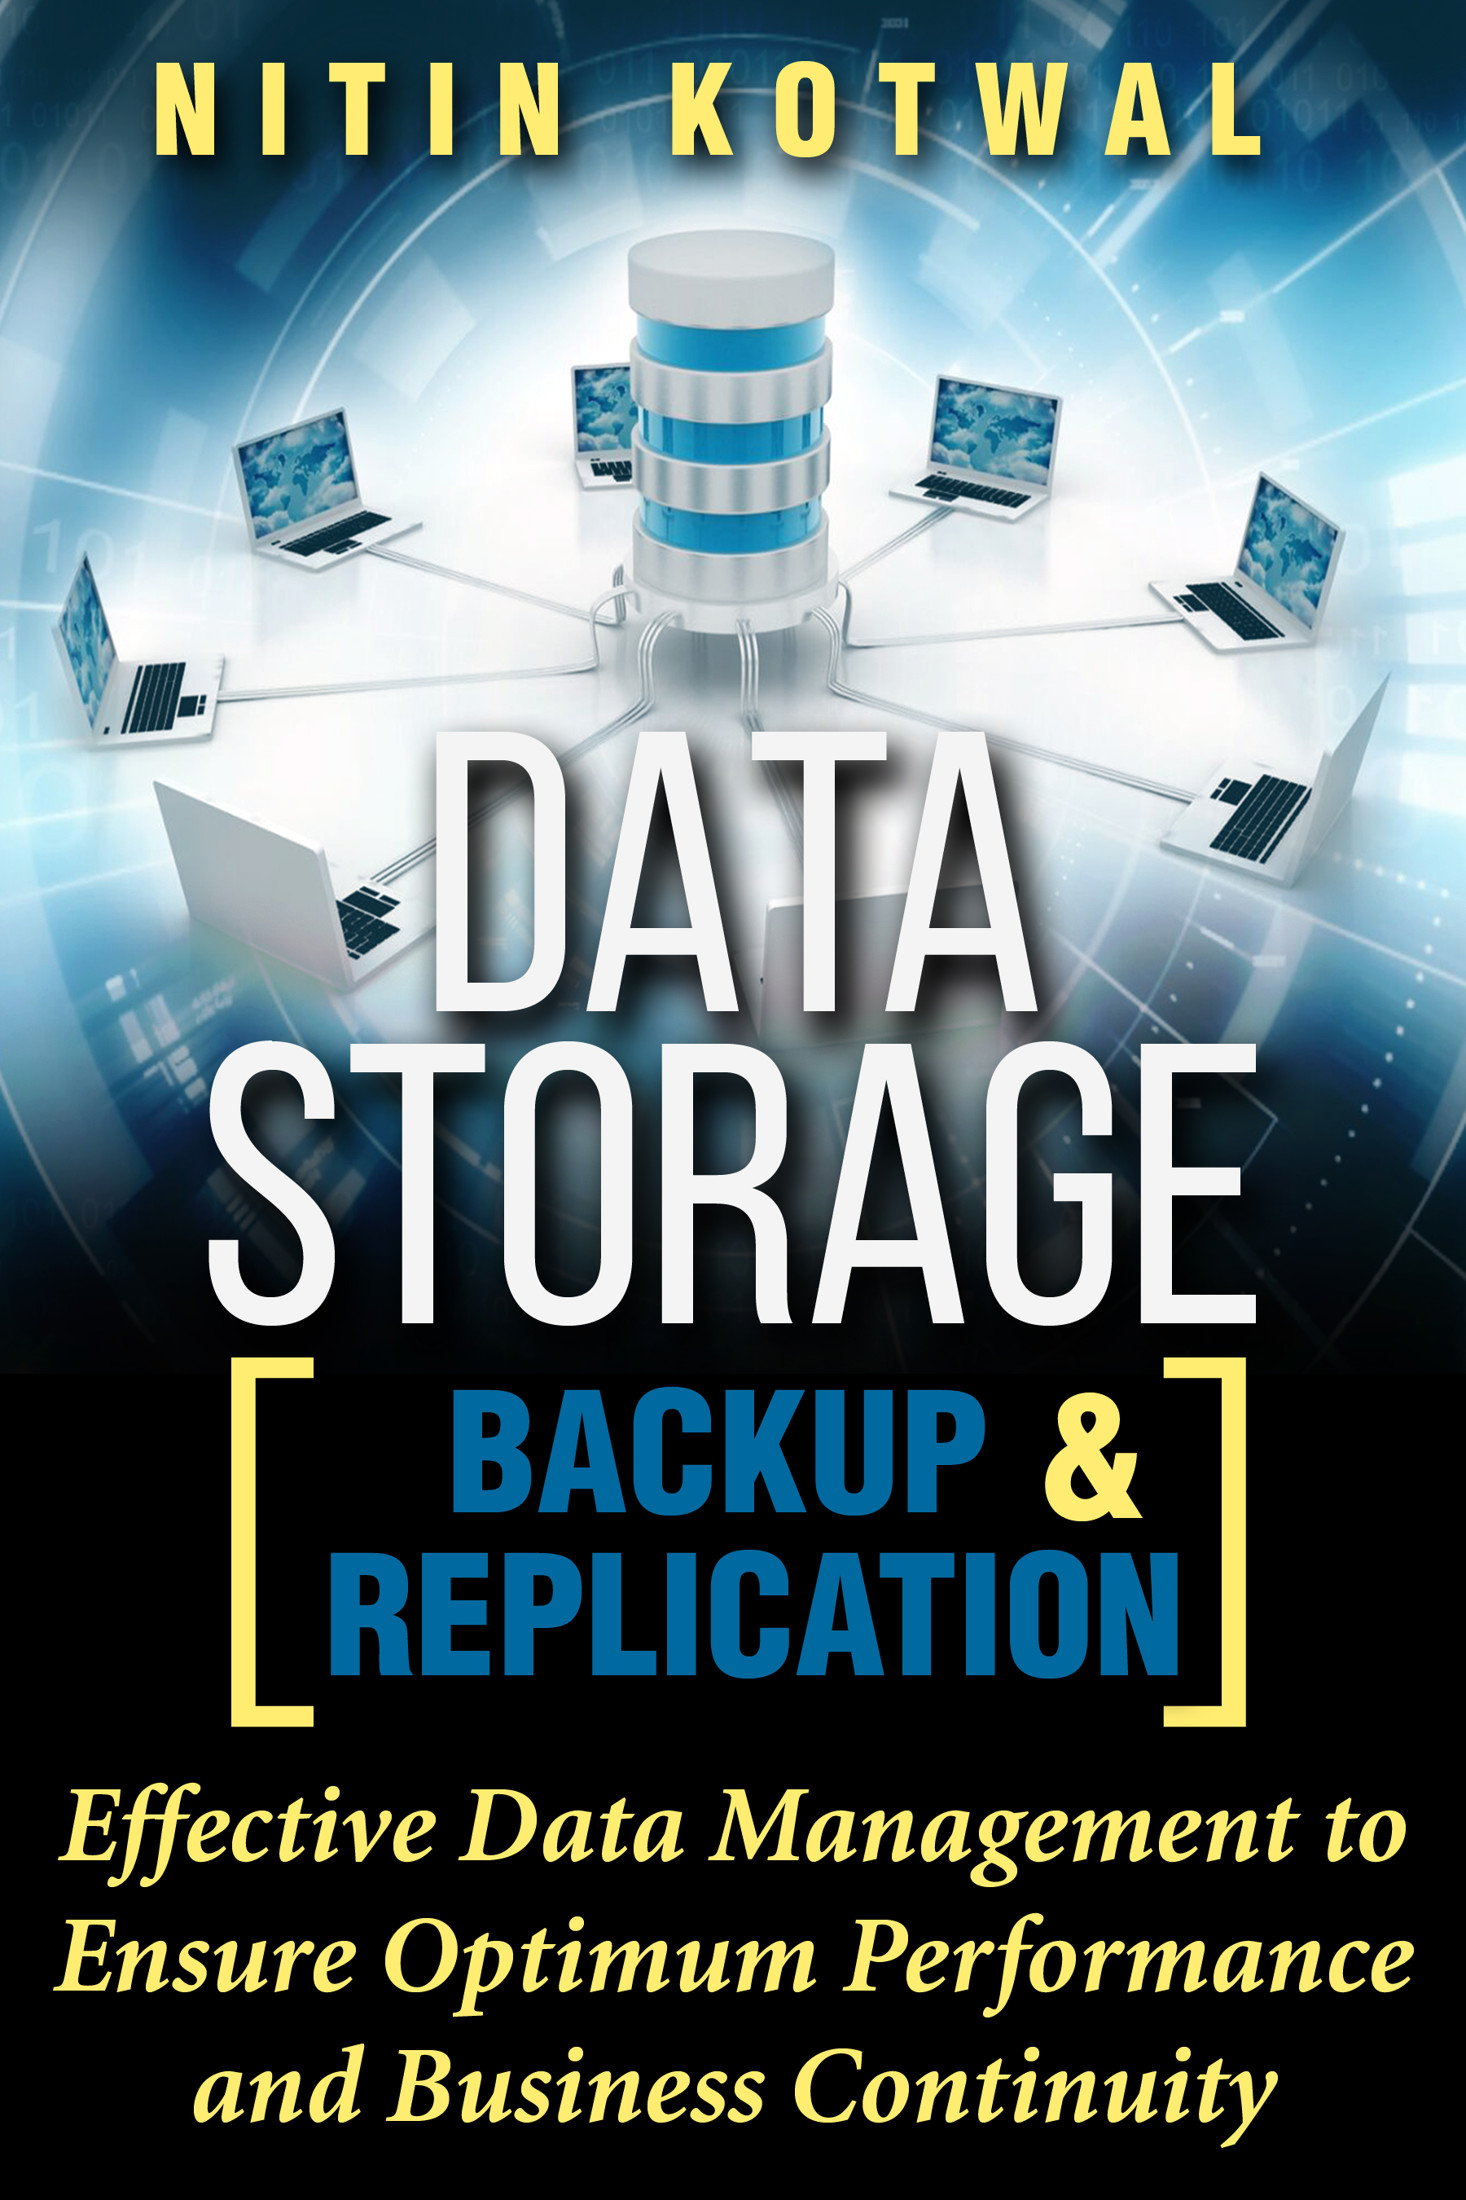 Data Storage Backup and Replication E- book